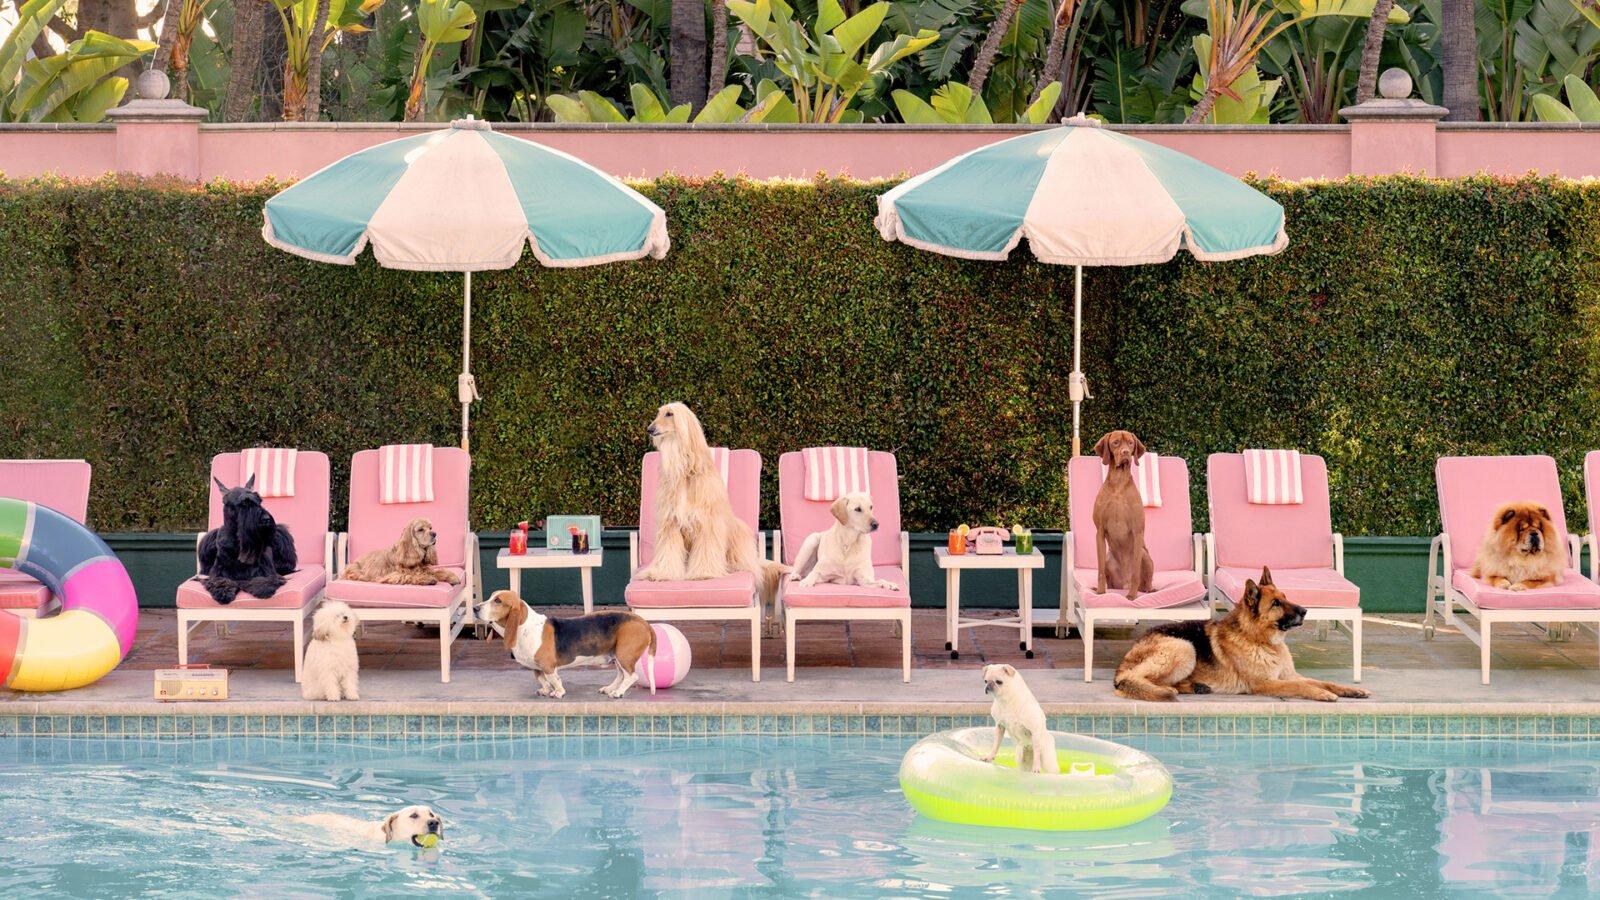 Gray Malin photographs dogs at the pool